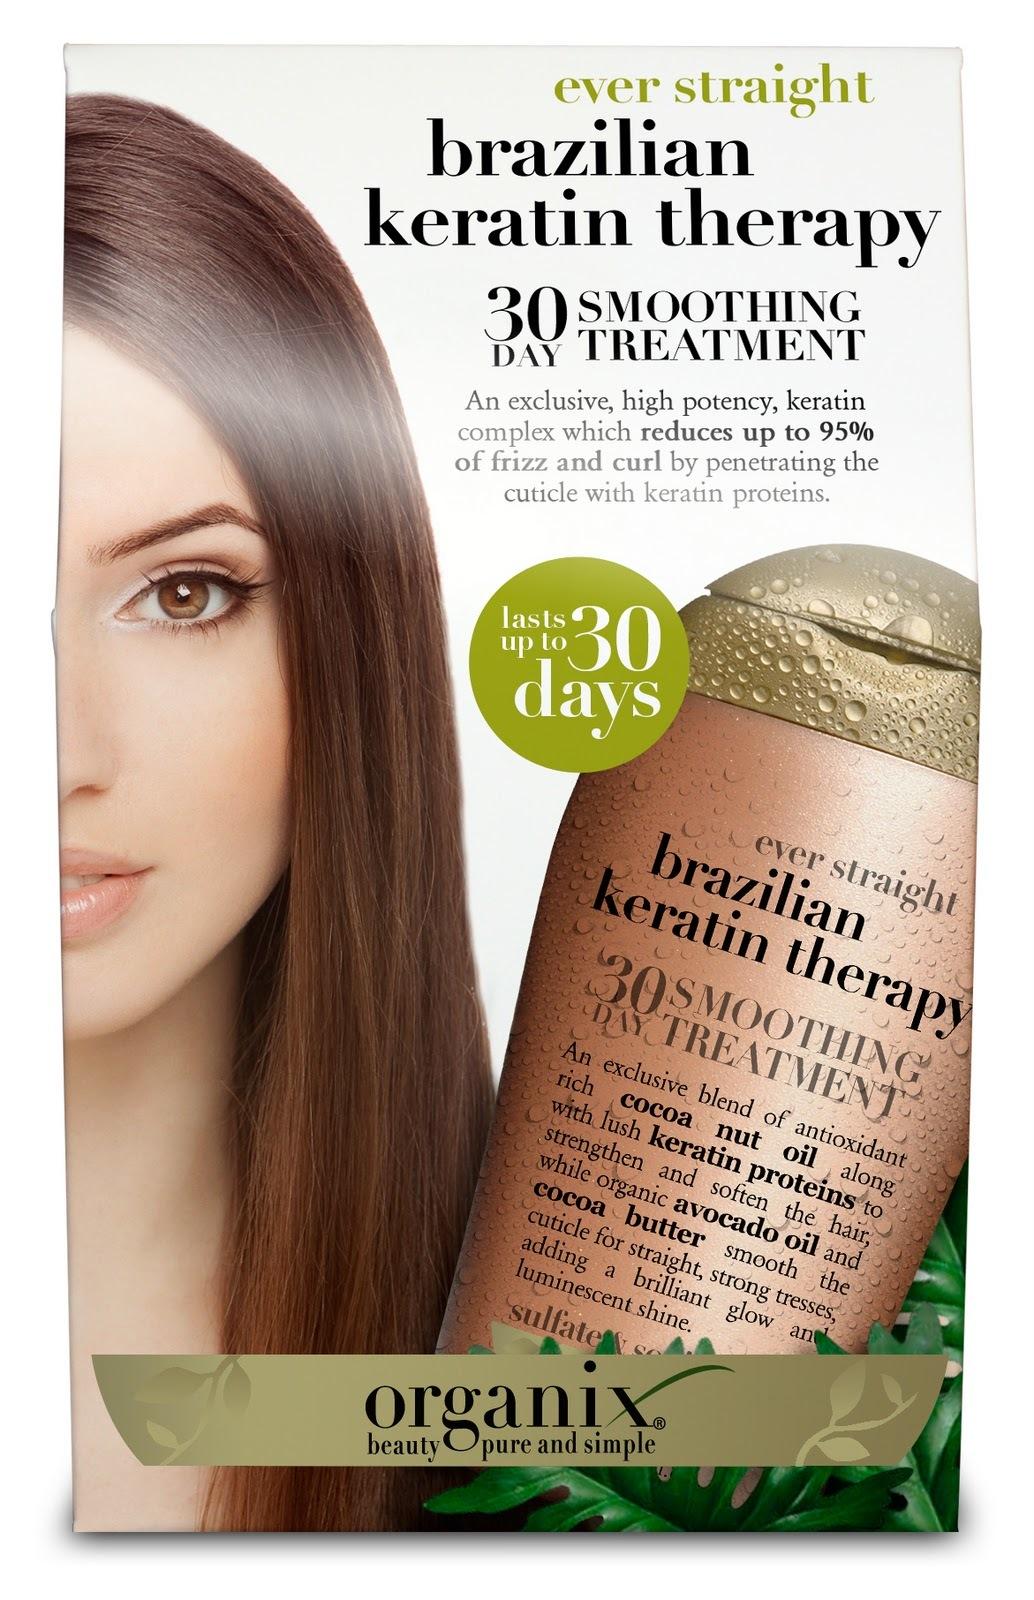 Organix Brazilian Keratin Therapy 30-Day Smoothing Treatment reviews ...